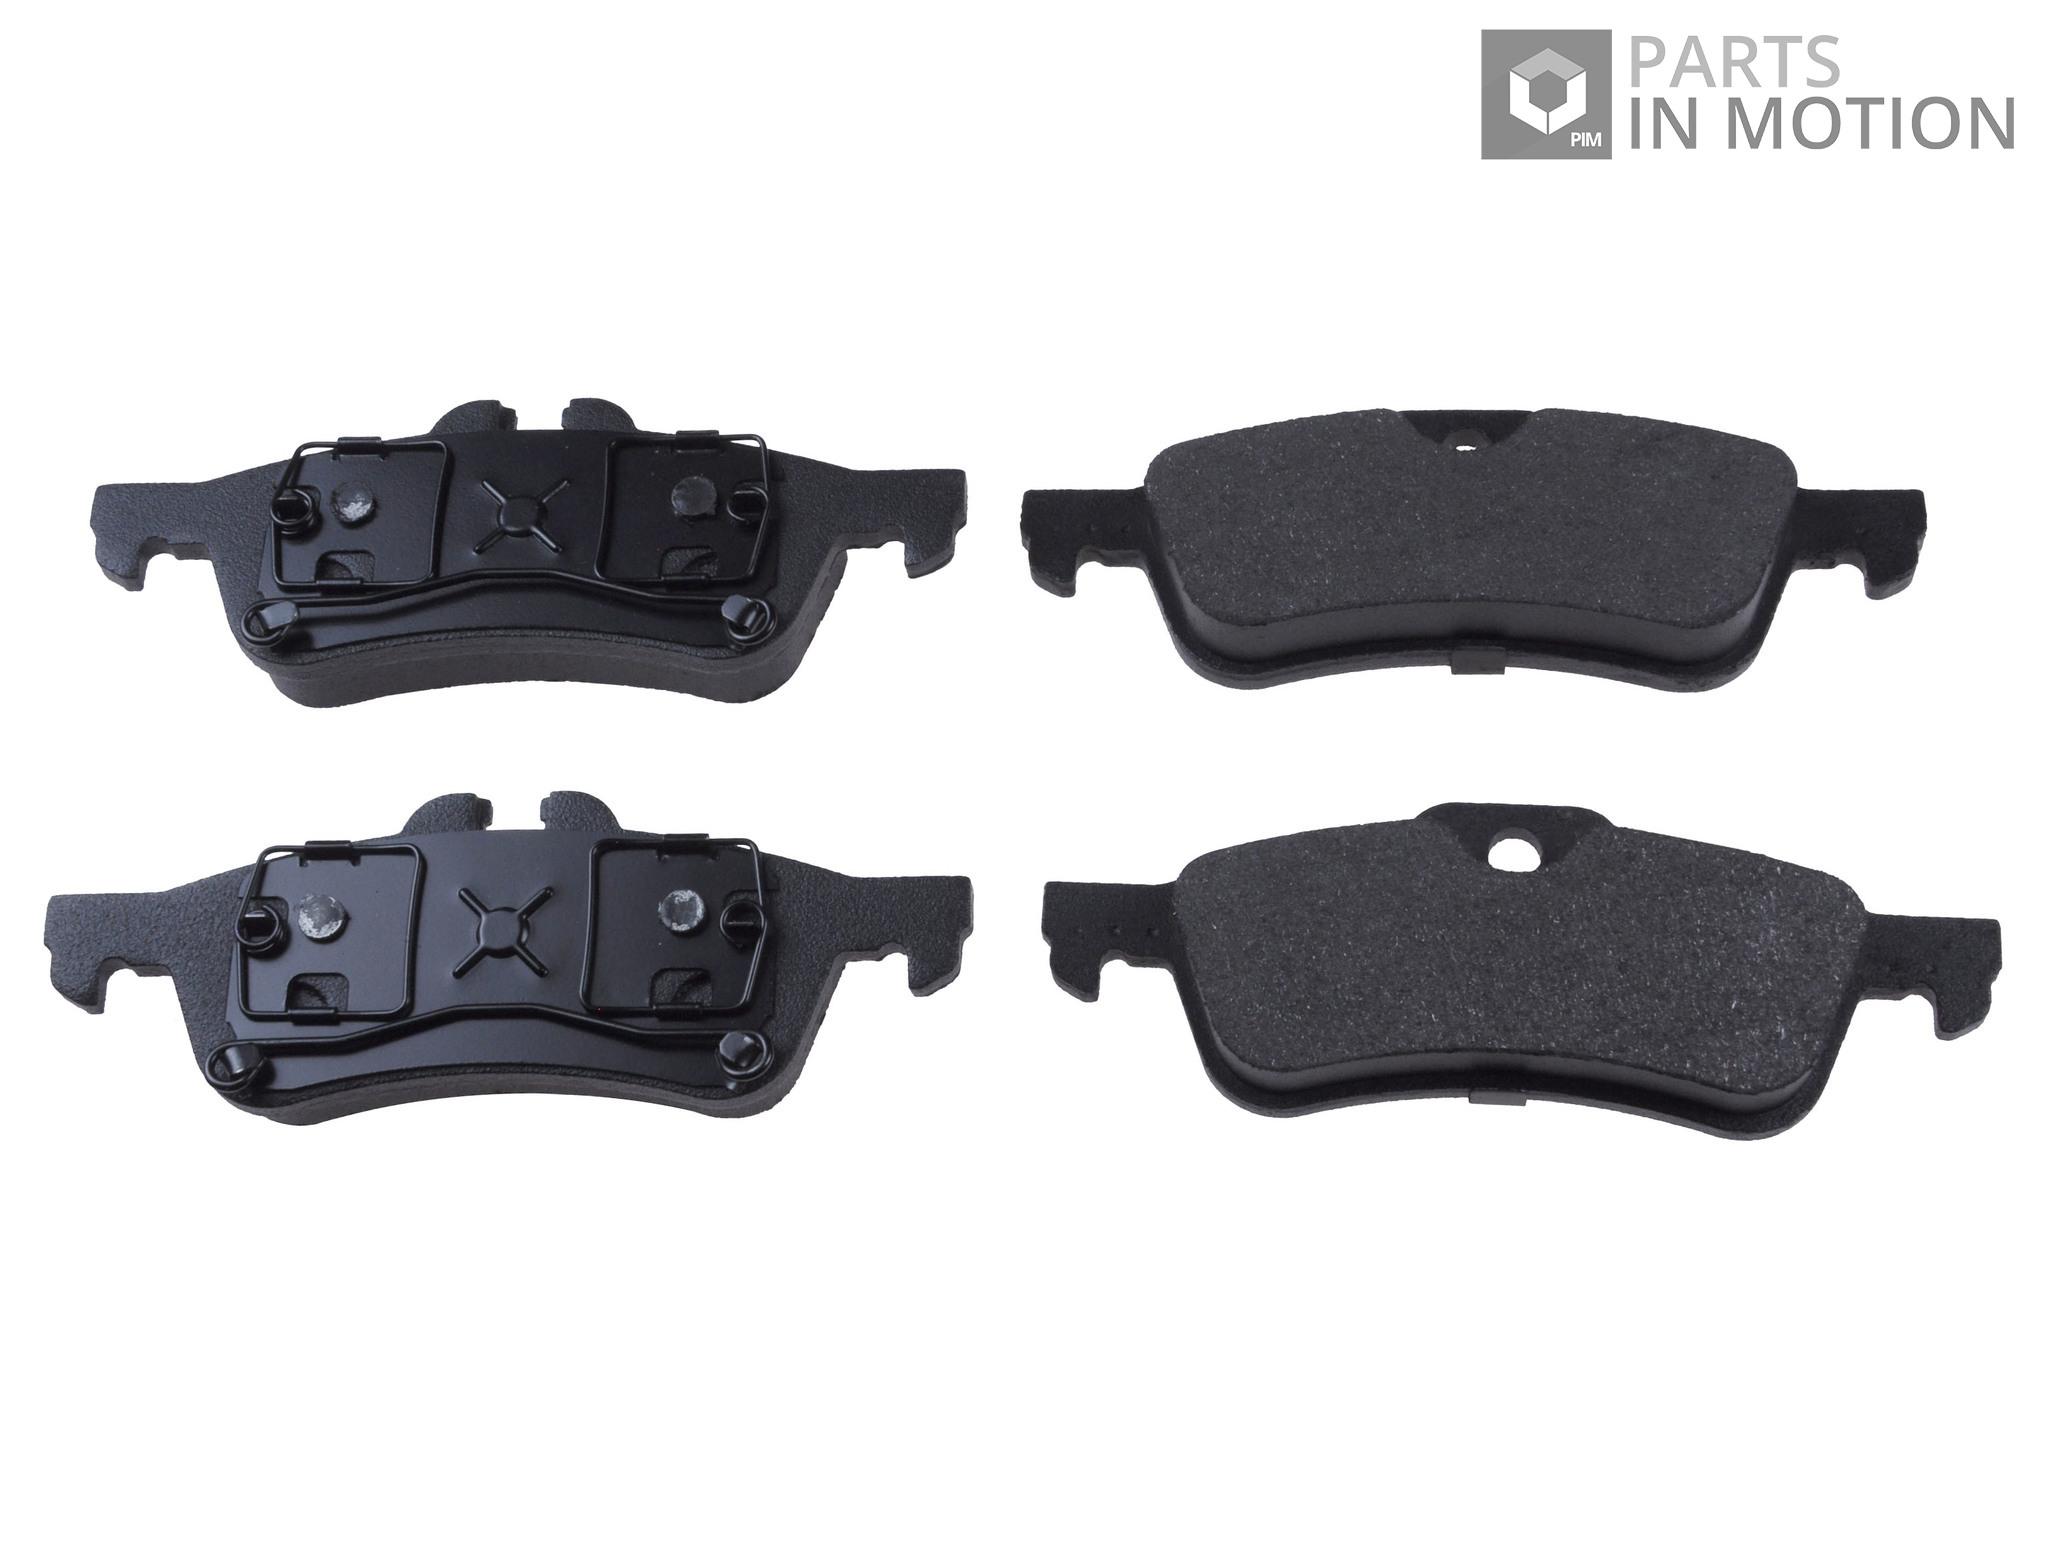 Brake Pads Set fits MINI ONE Rear 1.4 1.4D 03 to 06 ADL 34211503077 34216761288